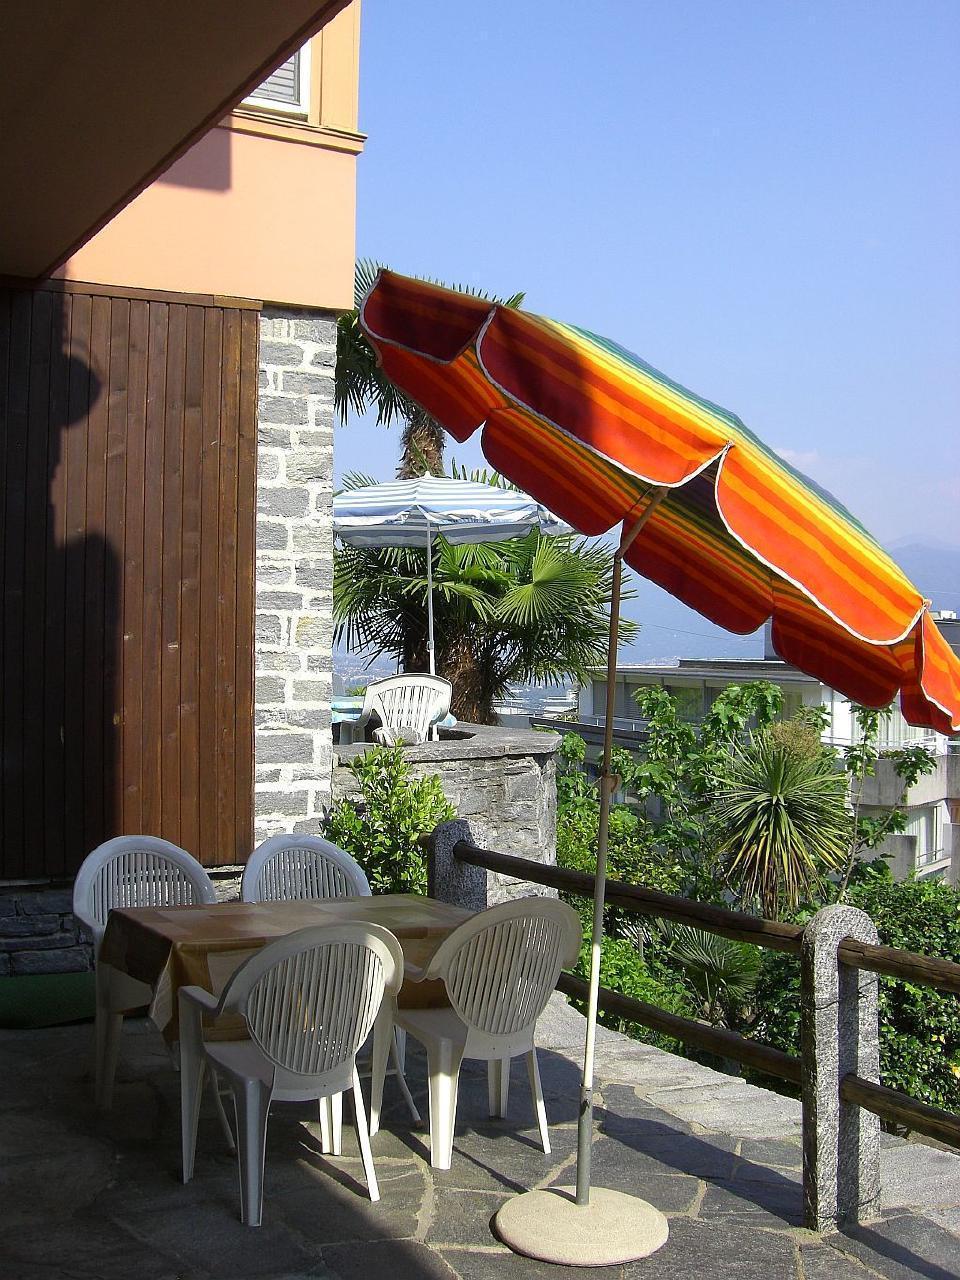 Holiday apartment ... zu Hause sicher -  unterwegs mit Bedacht... Il Réduit alle Rascane Orselina, Giardino (192974), Orselina, Lake Maggiore (CH), Ticino, Switzerland, picture 12